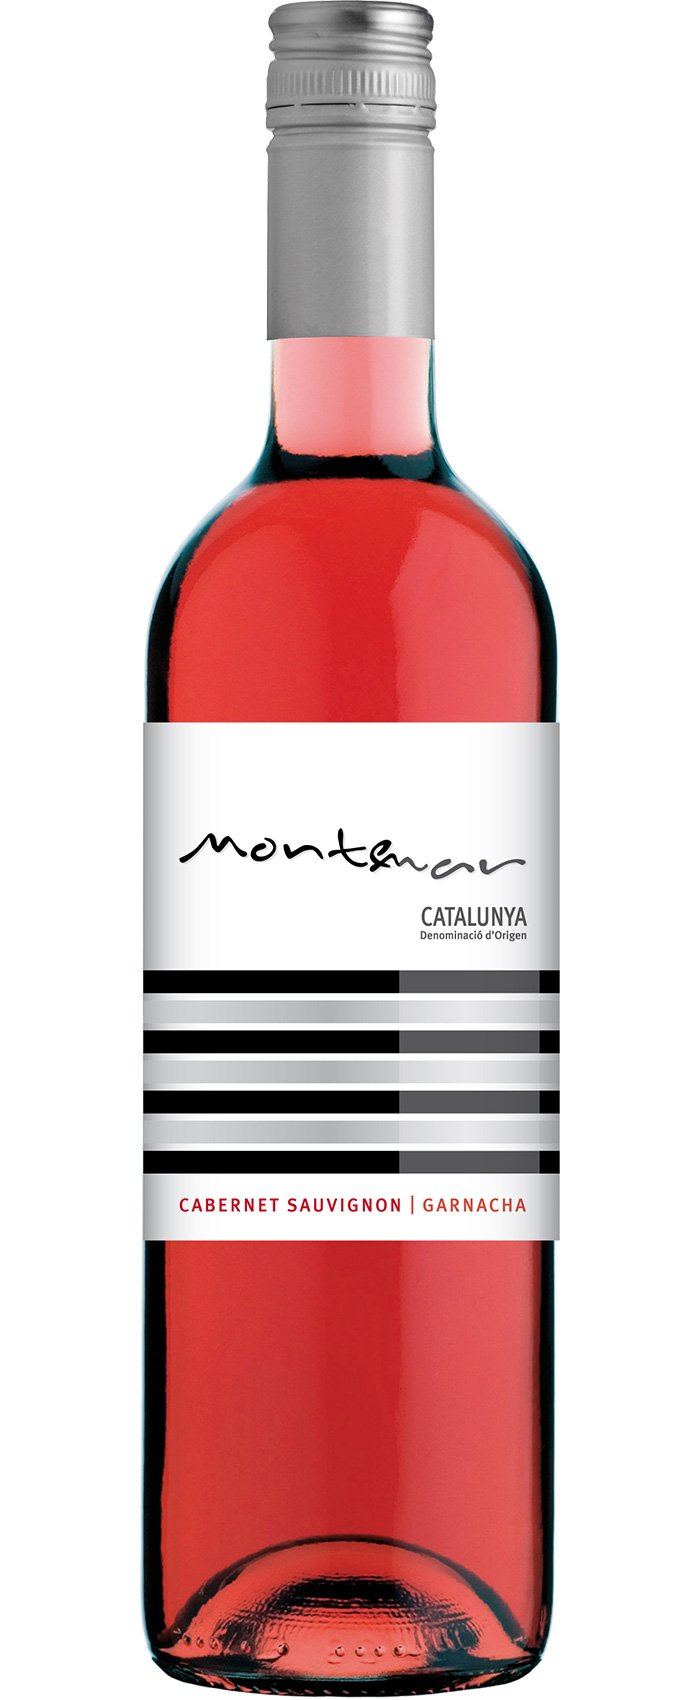 6x-075l-2017er-Montemar-Cabernet-Sauvignon-Rosado-Catalunya-DO-Spanien-Ros-Wein-trocken